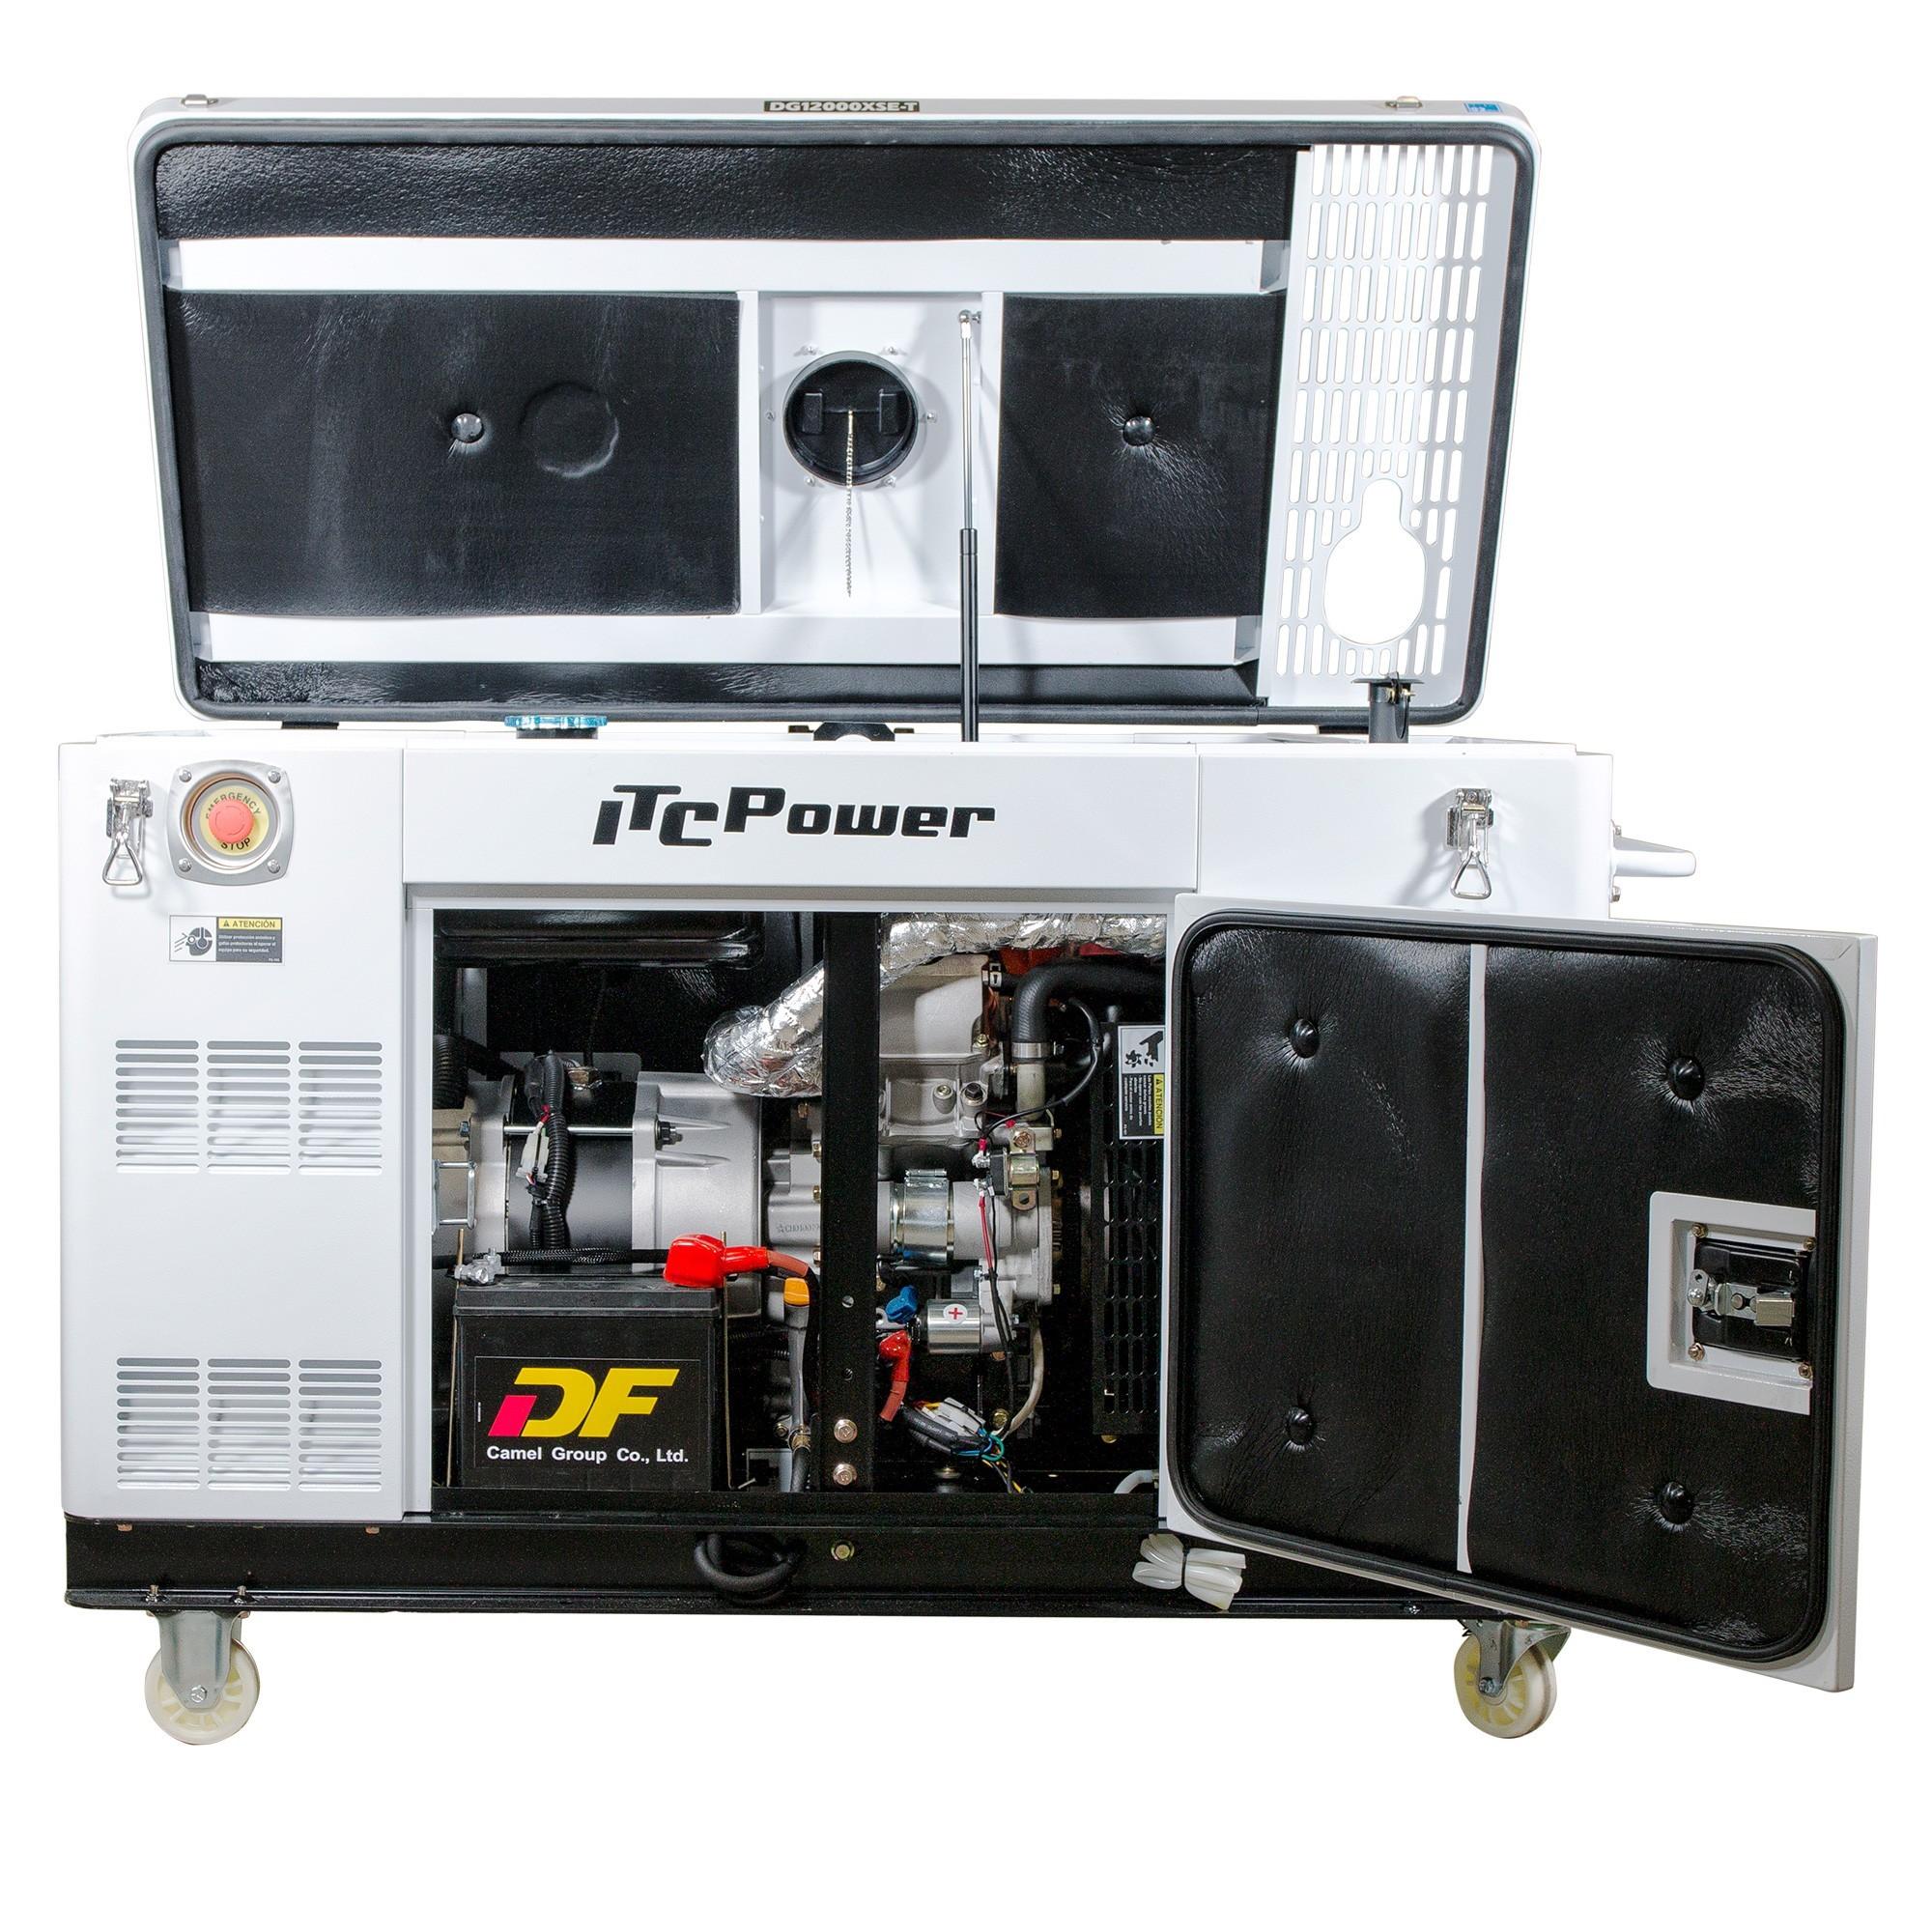 VORVERKAUF!!! ITC POWER 12,5 kVA Wassergekühlt Diesel DG12000XSE-T Stromaggregat